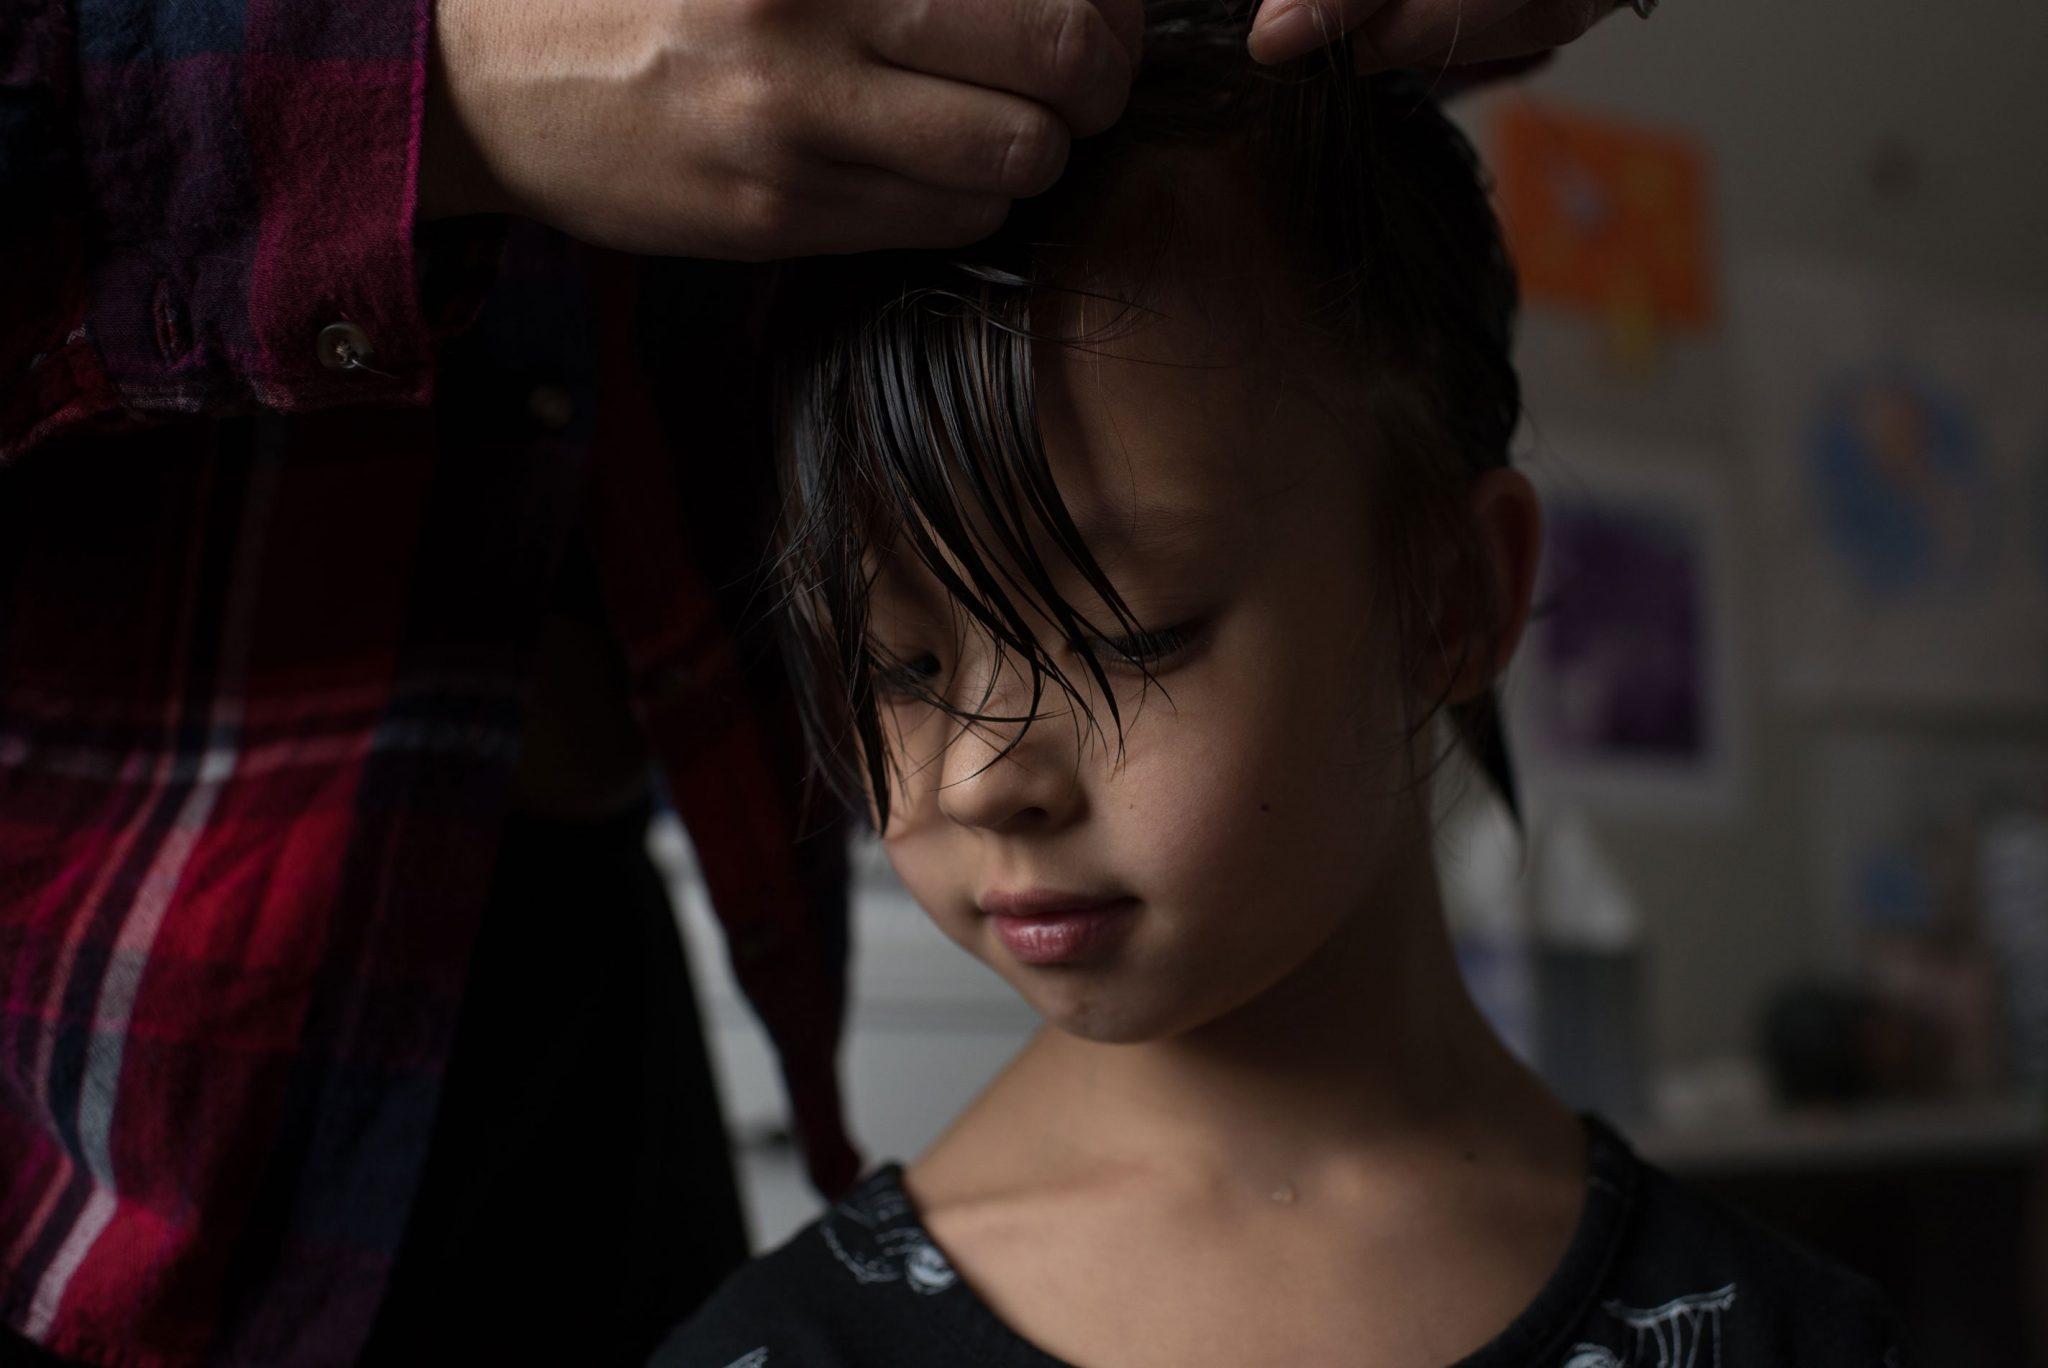 mom braiding child's hair